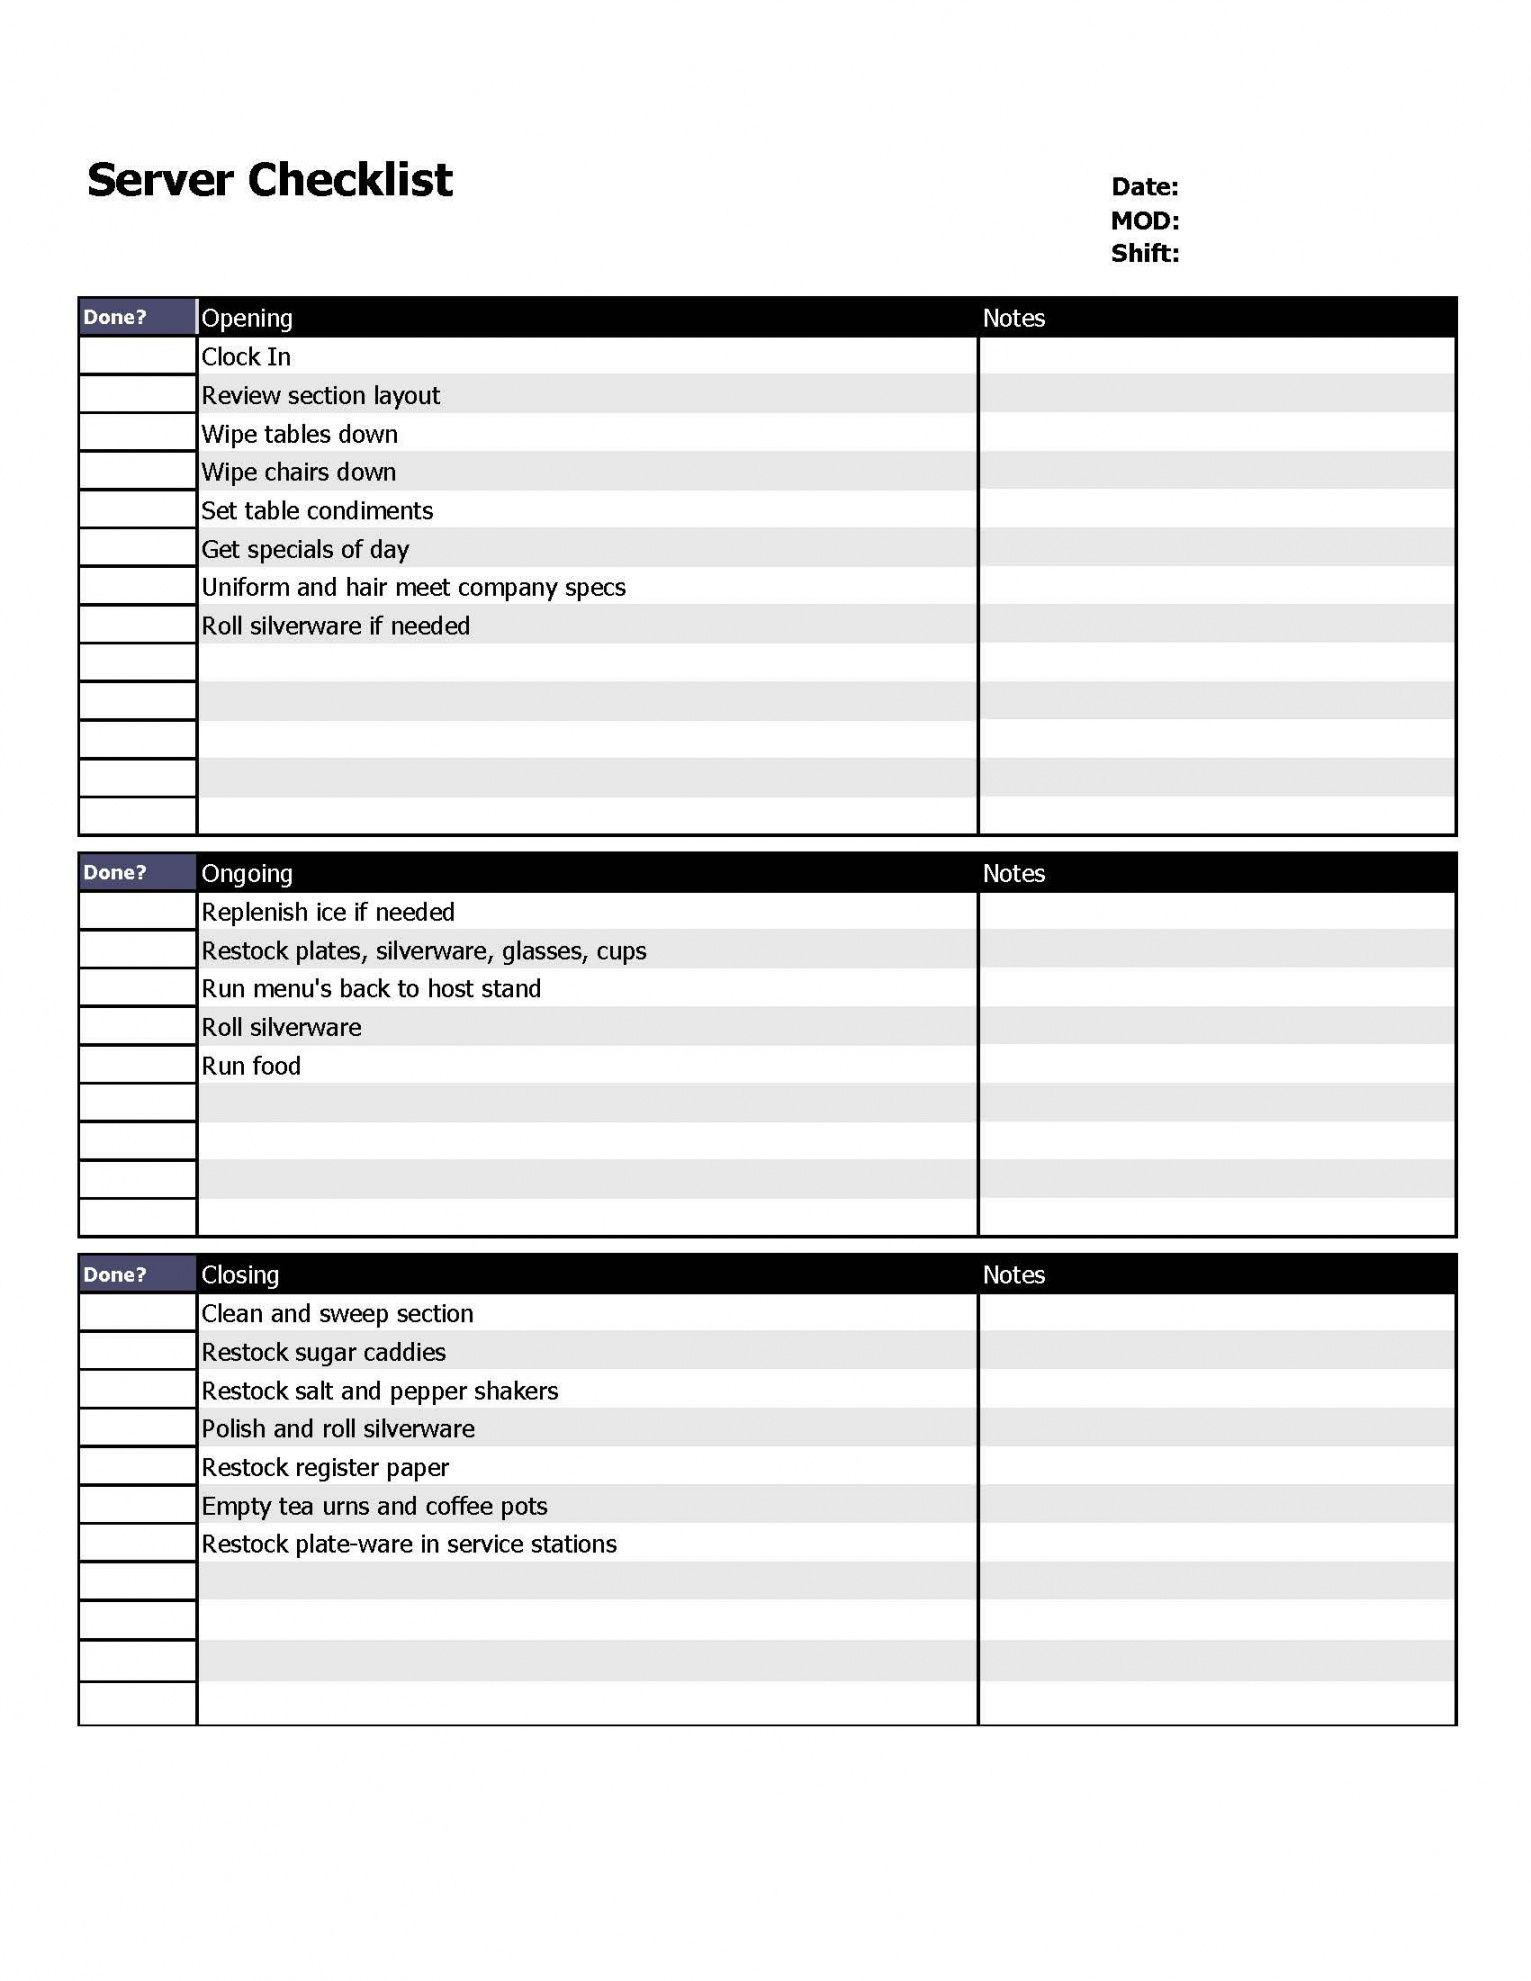 Server Monitoring Checklist Template